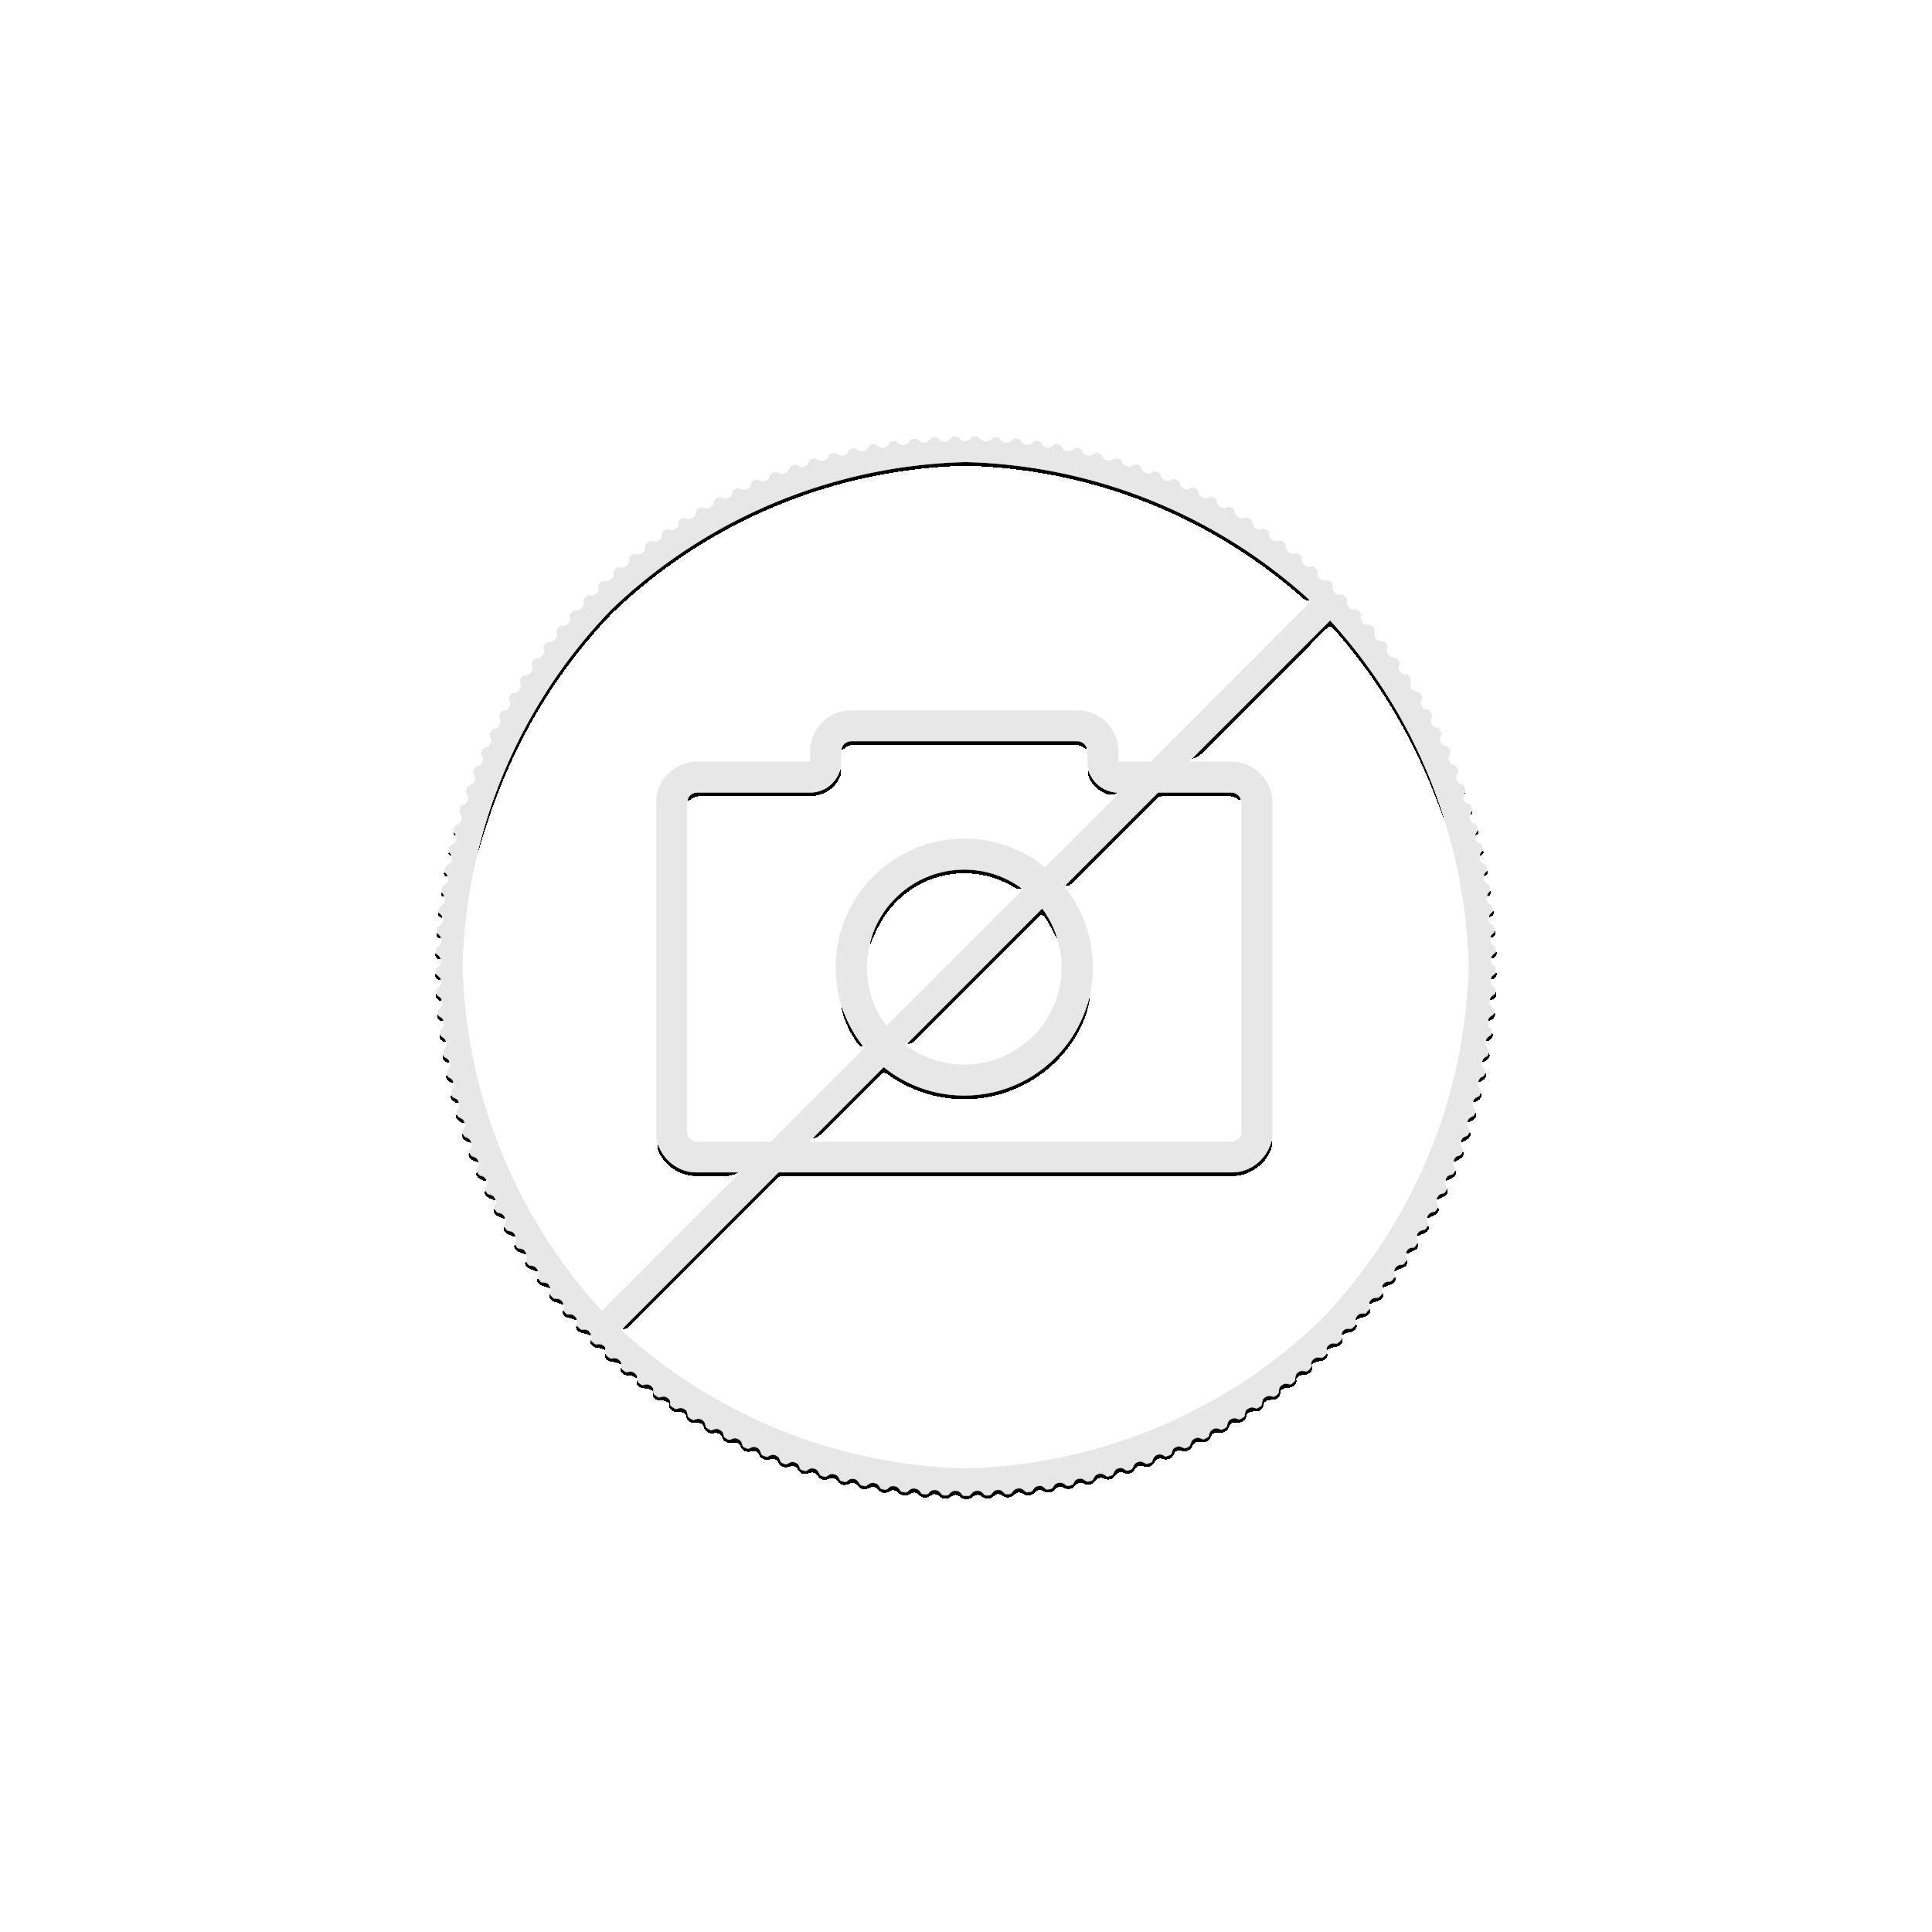 1 troy ounce silver Britannia coin various years